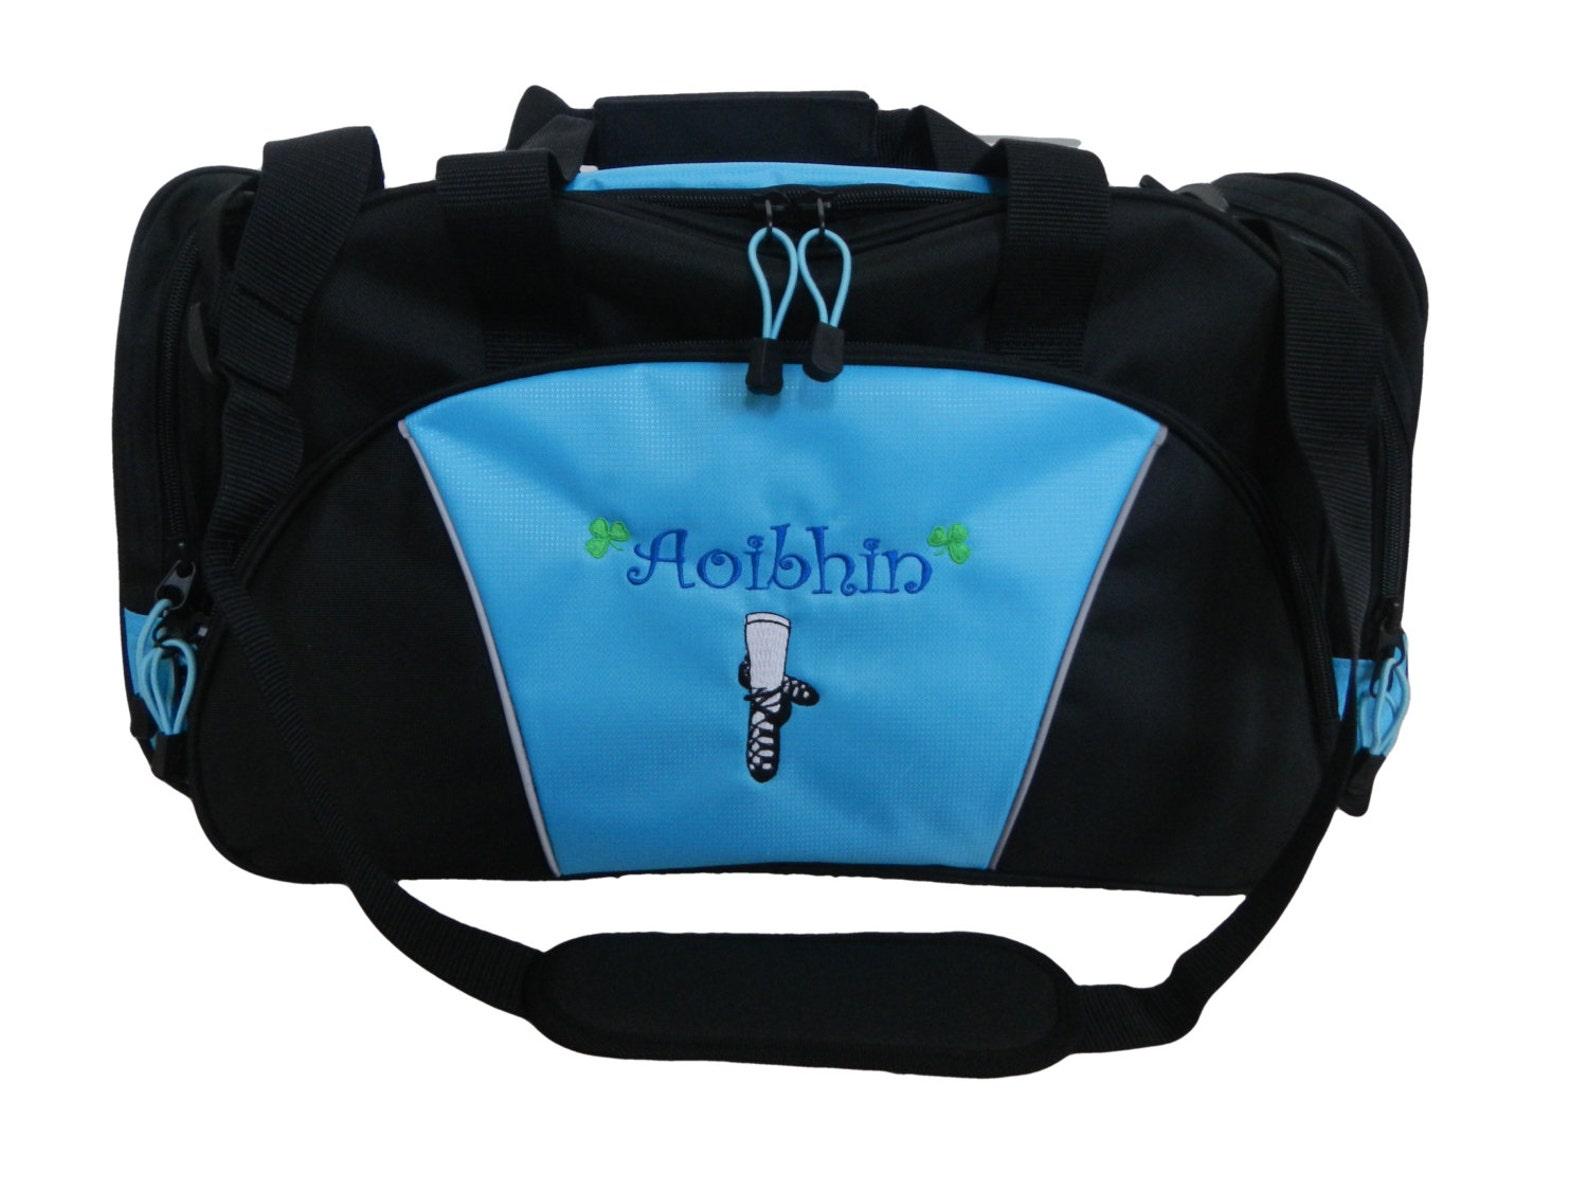 duffel bag personalized dancer dance irish dance jig ghillie shoes celtic shamrock ballet girl monogrammed duffle travel